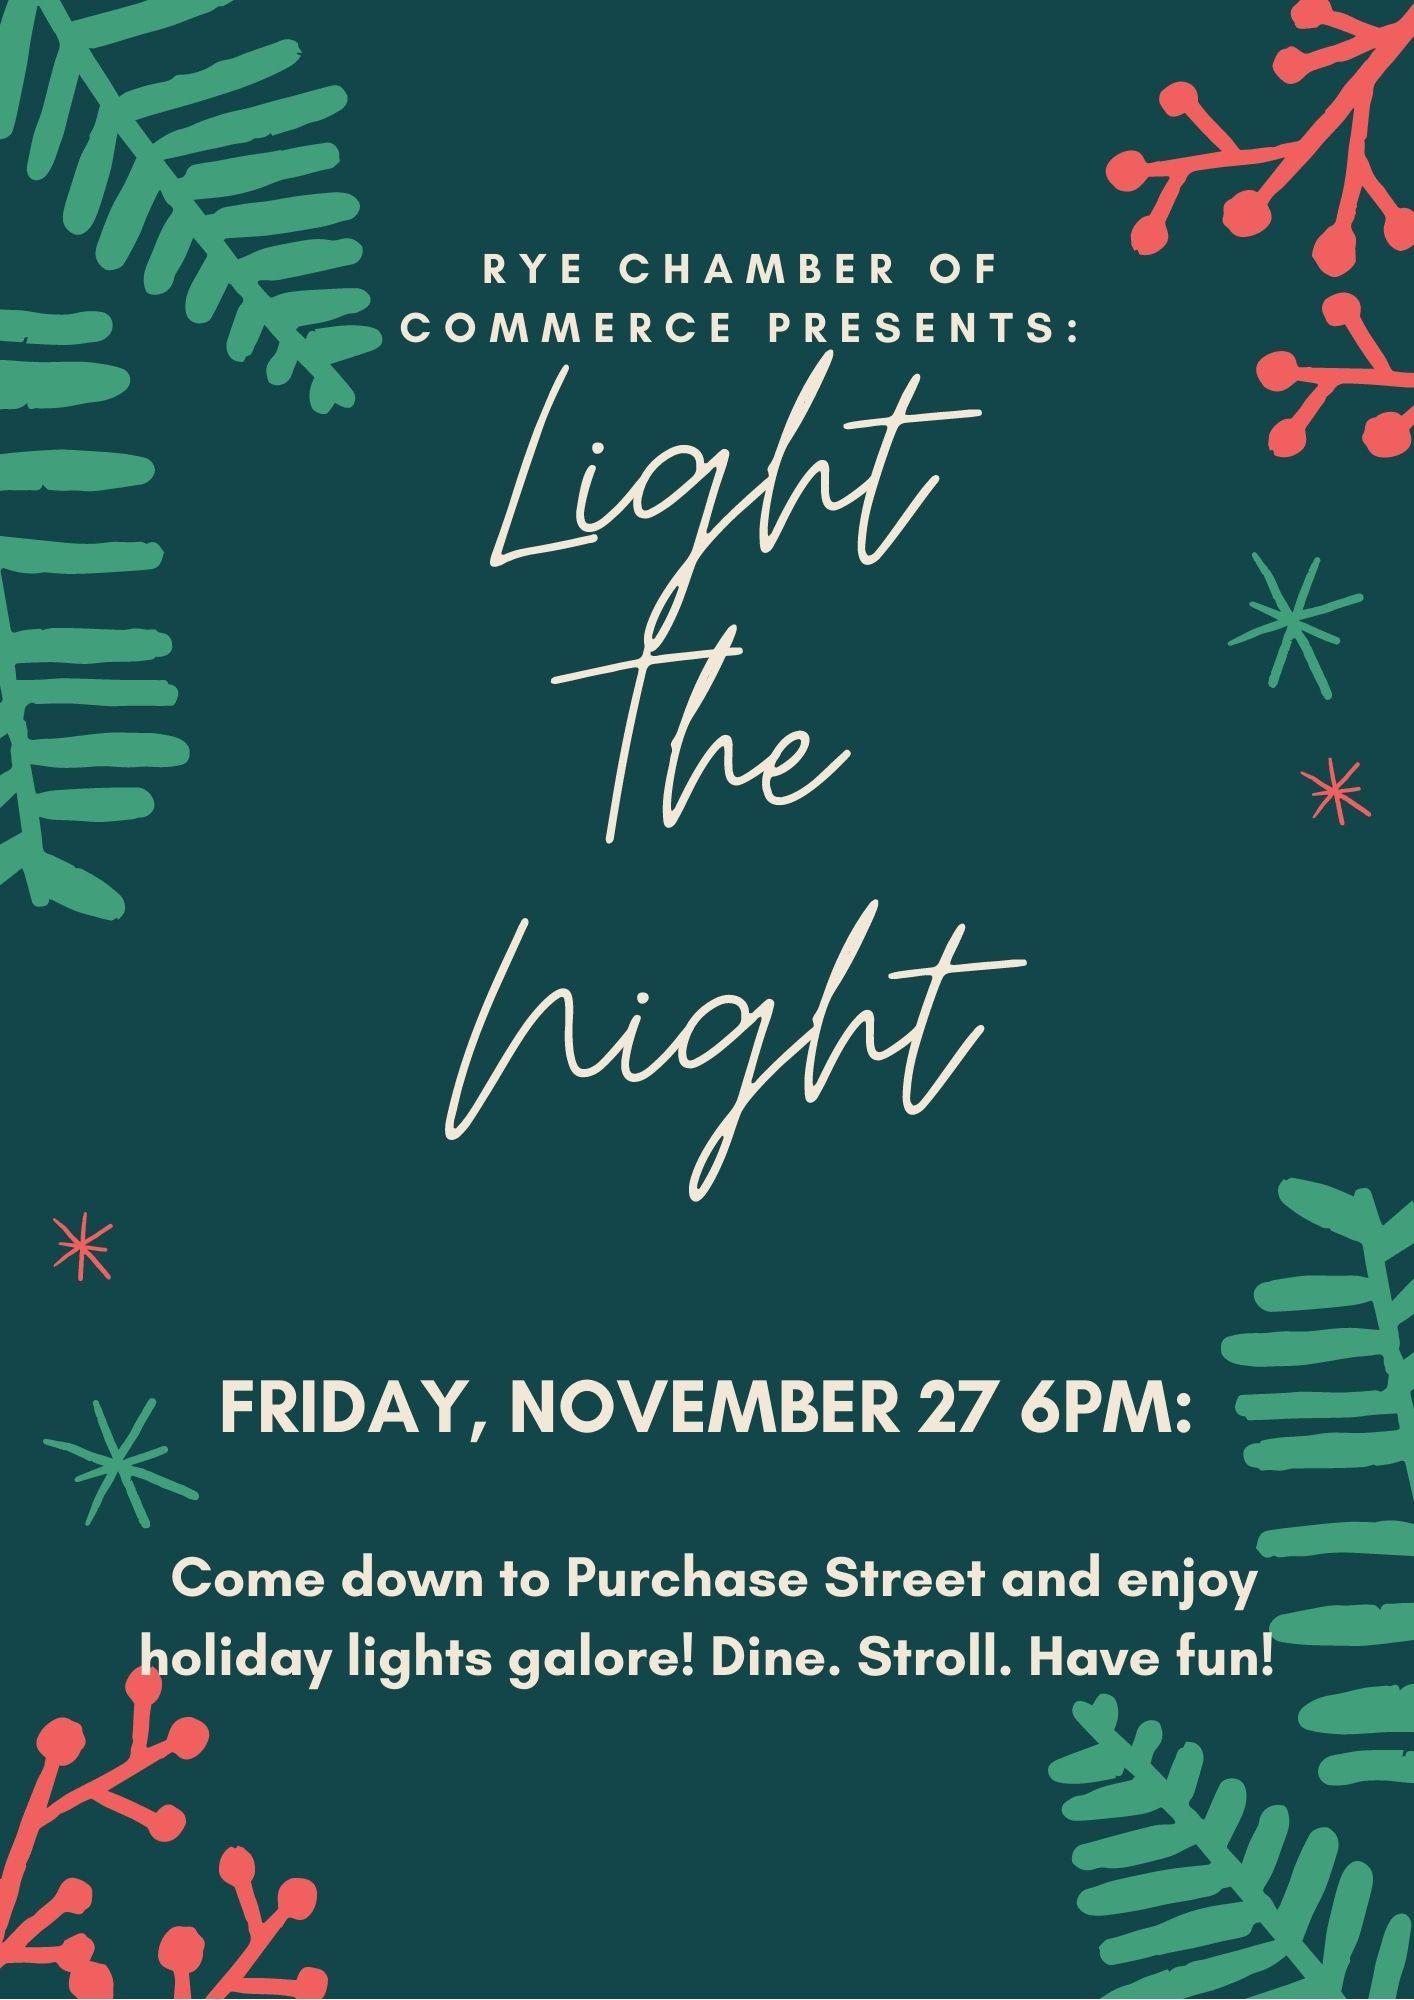 Rye Chamber of Commerce - 11-27-2020 Light the Night